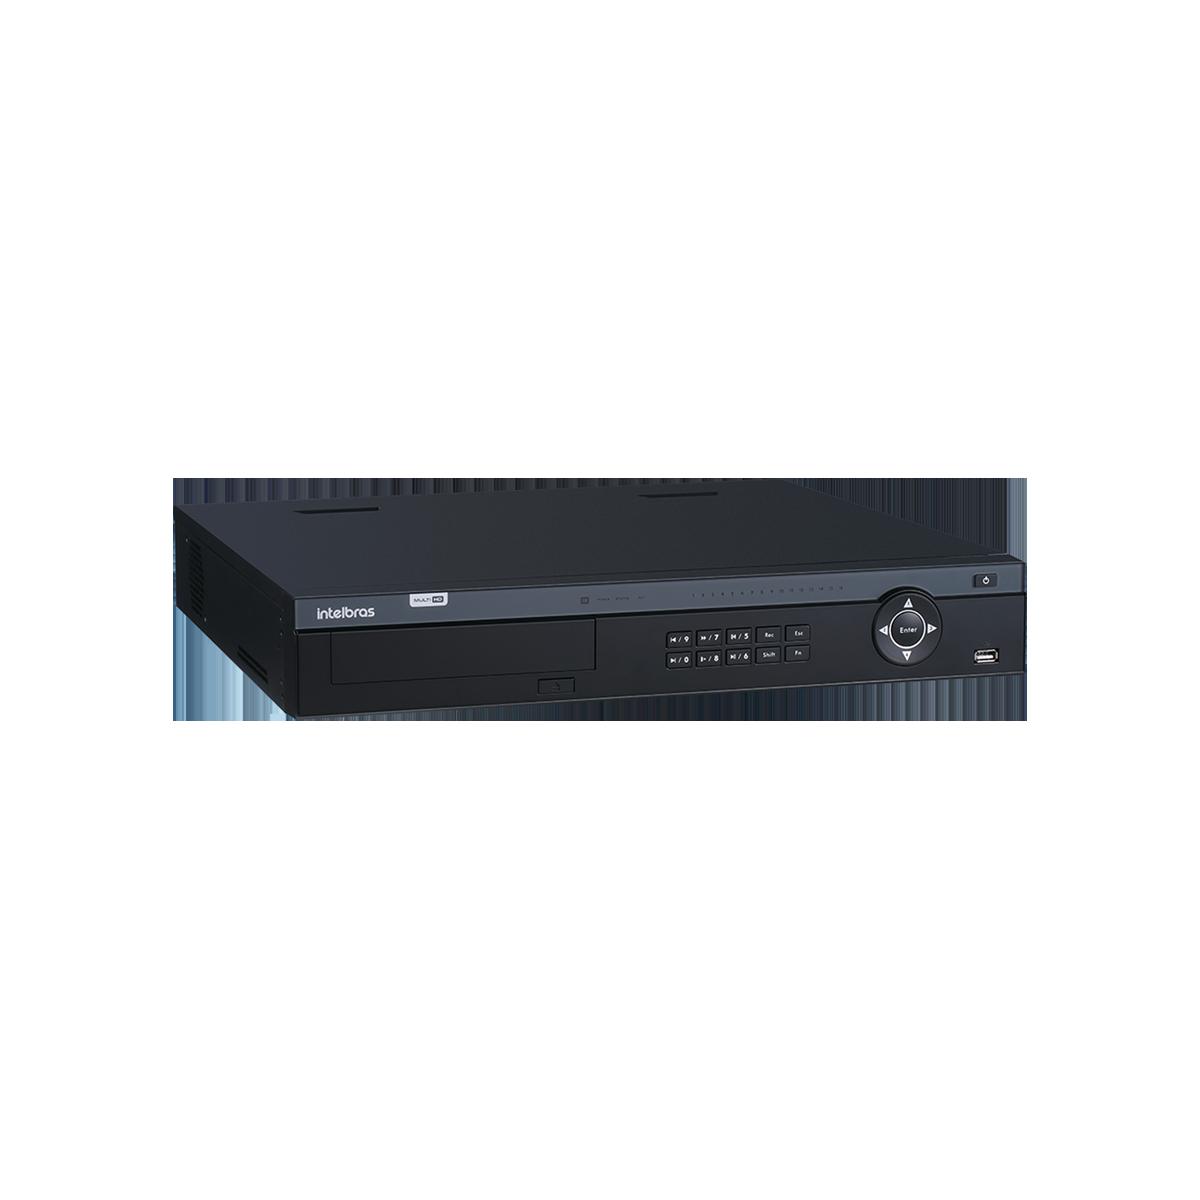 MHDX 7132 Gravador digital de vídeo 32 canais